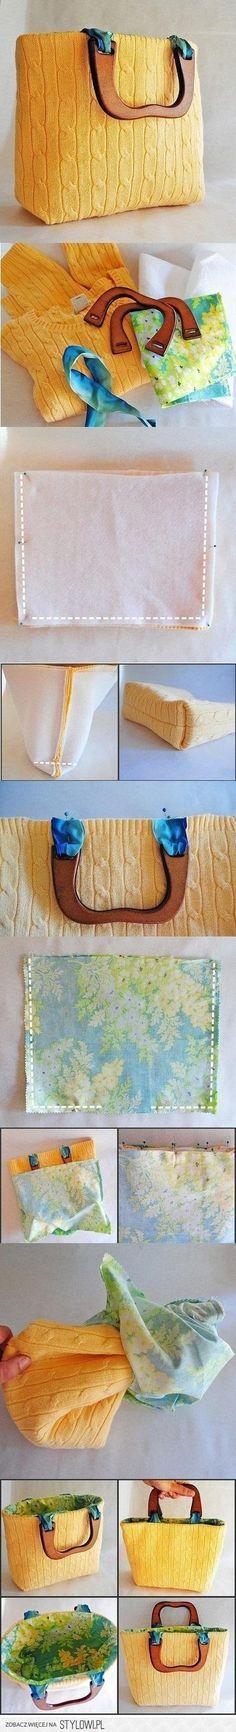 Bag tutorial by jannine